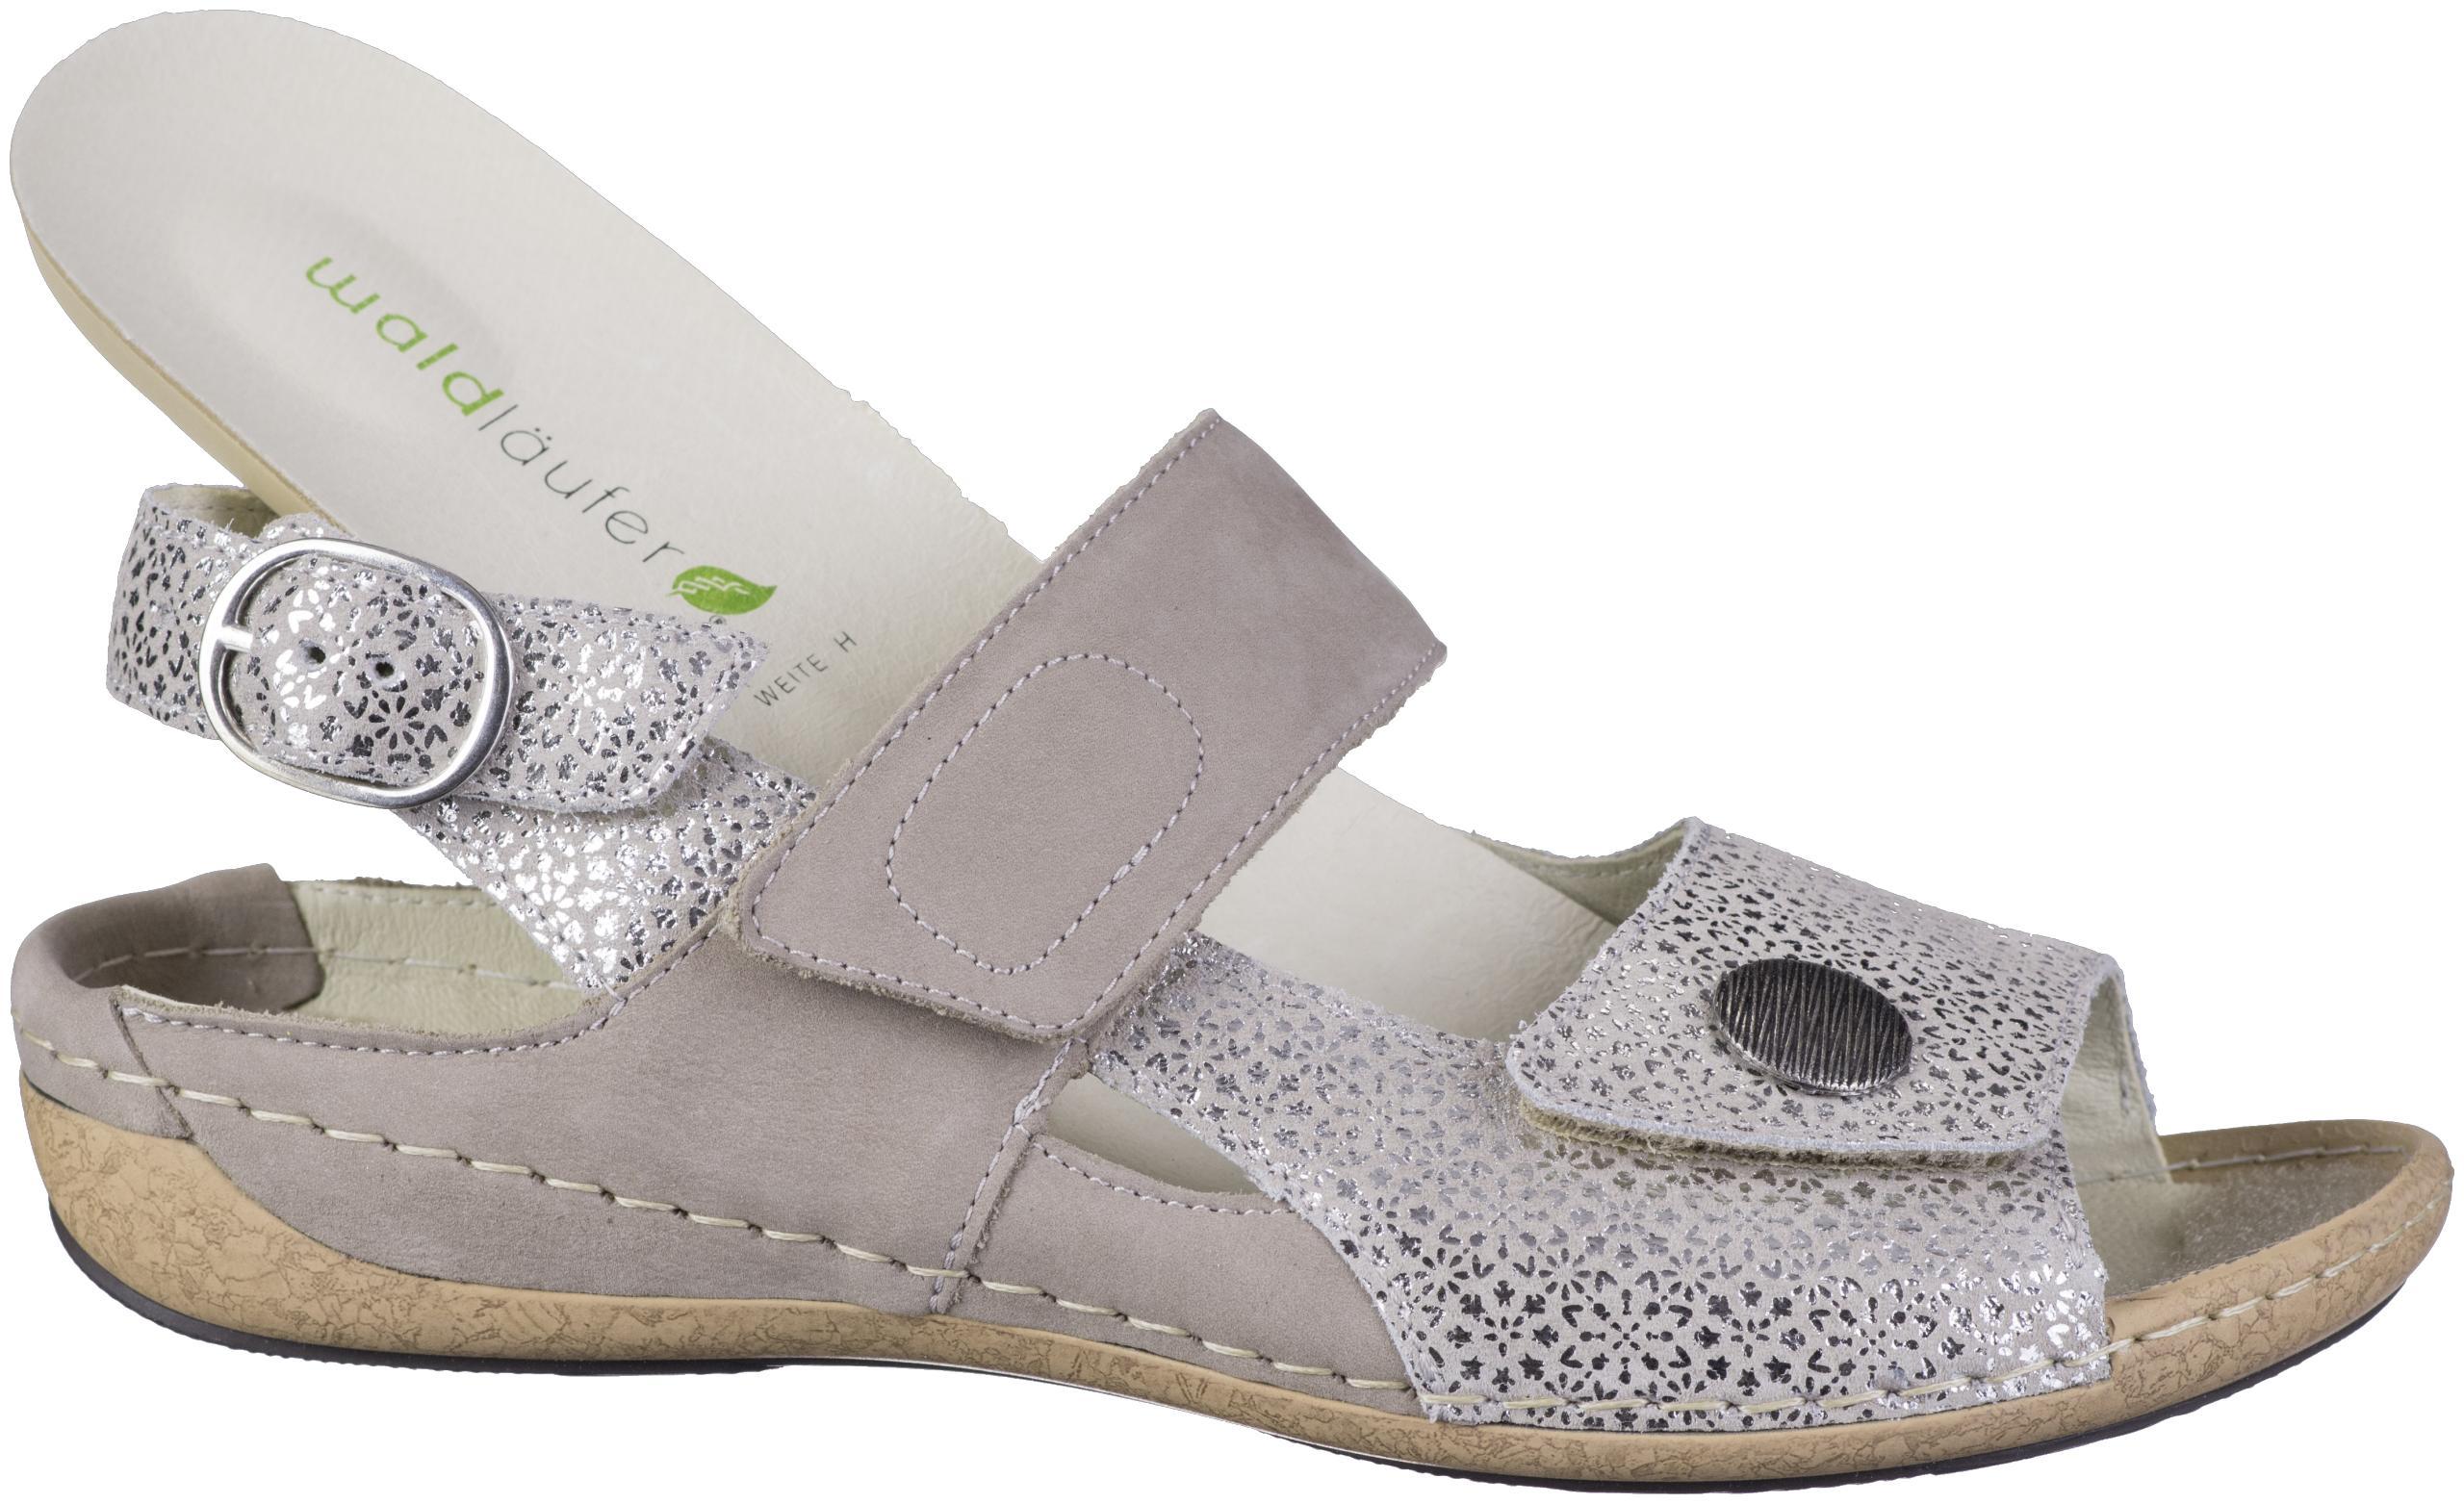 WALDLÄUFER Heliett 25 Comfort Sandale platinbeige